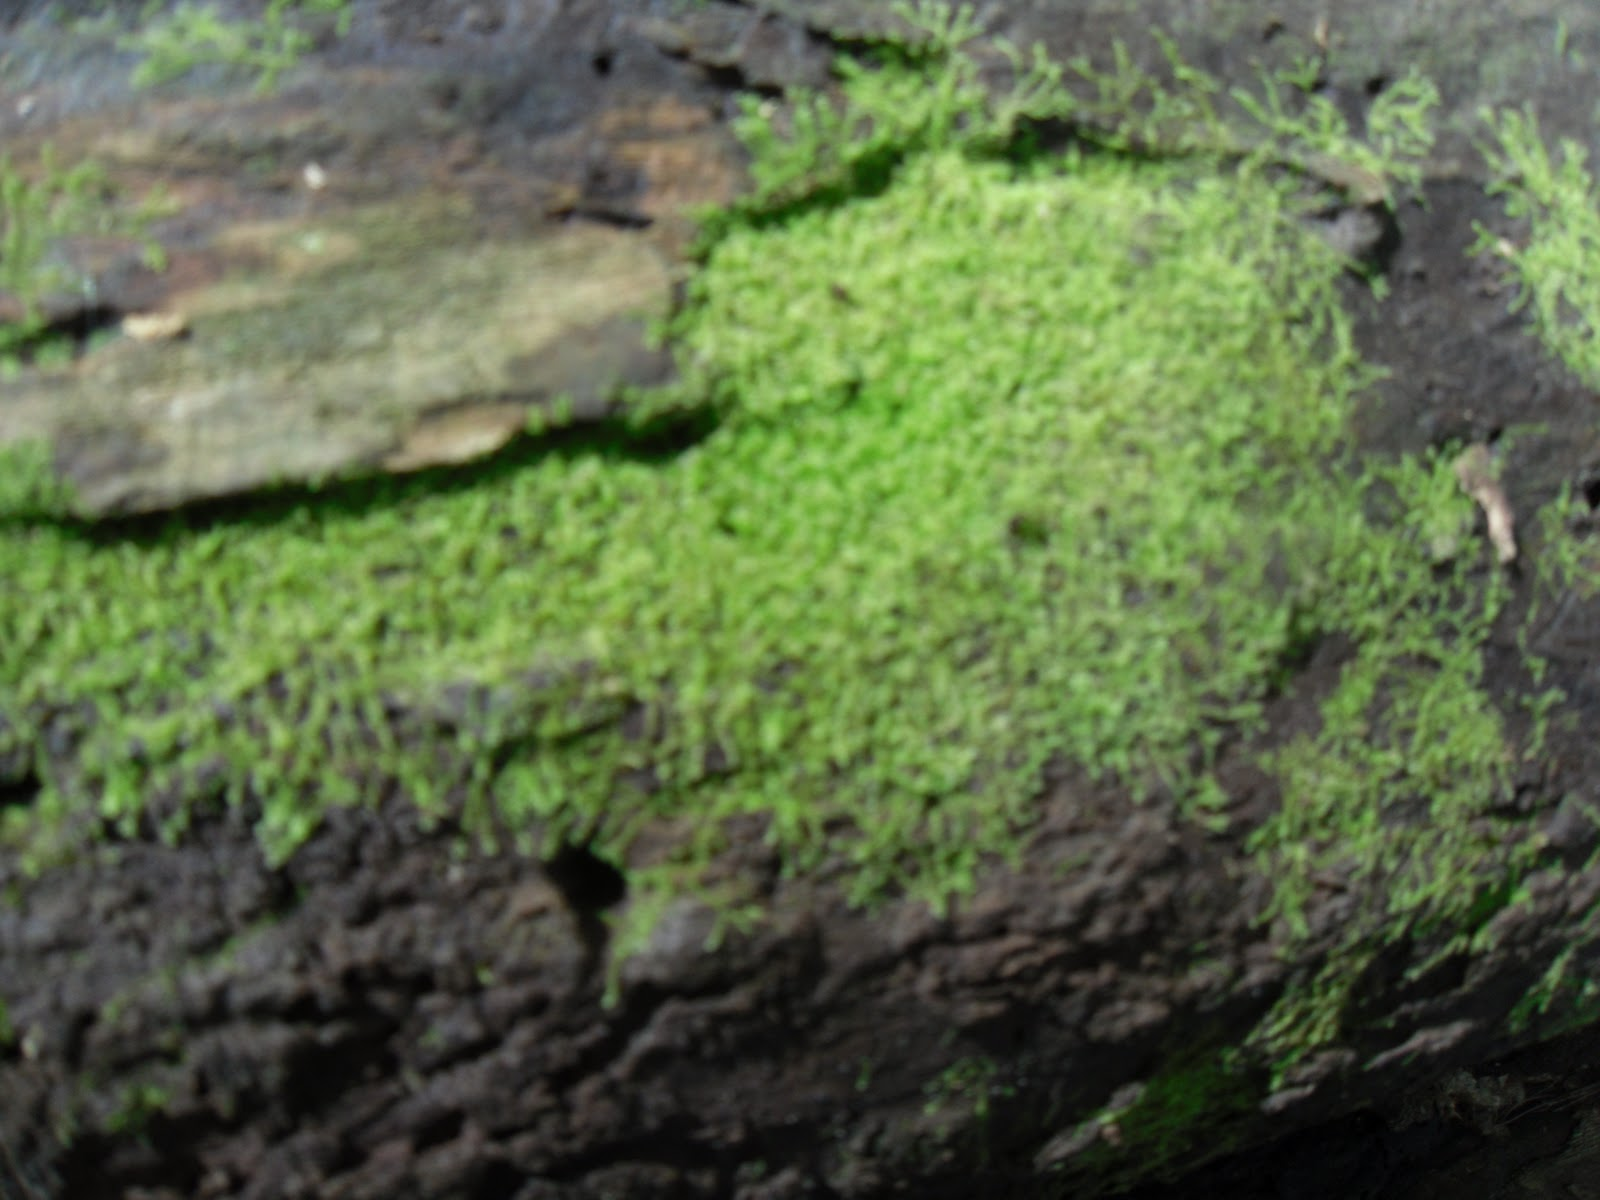 Kelcie S Non Vascular Plant Blog Specimen 3 Leafy Liverwort